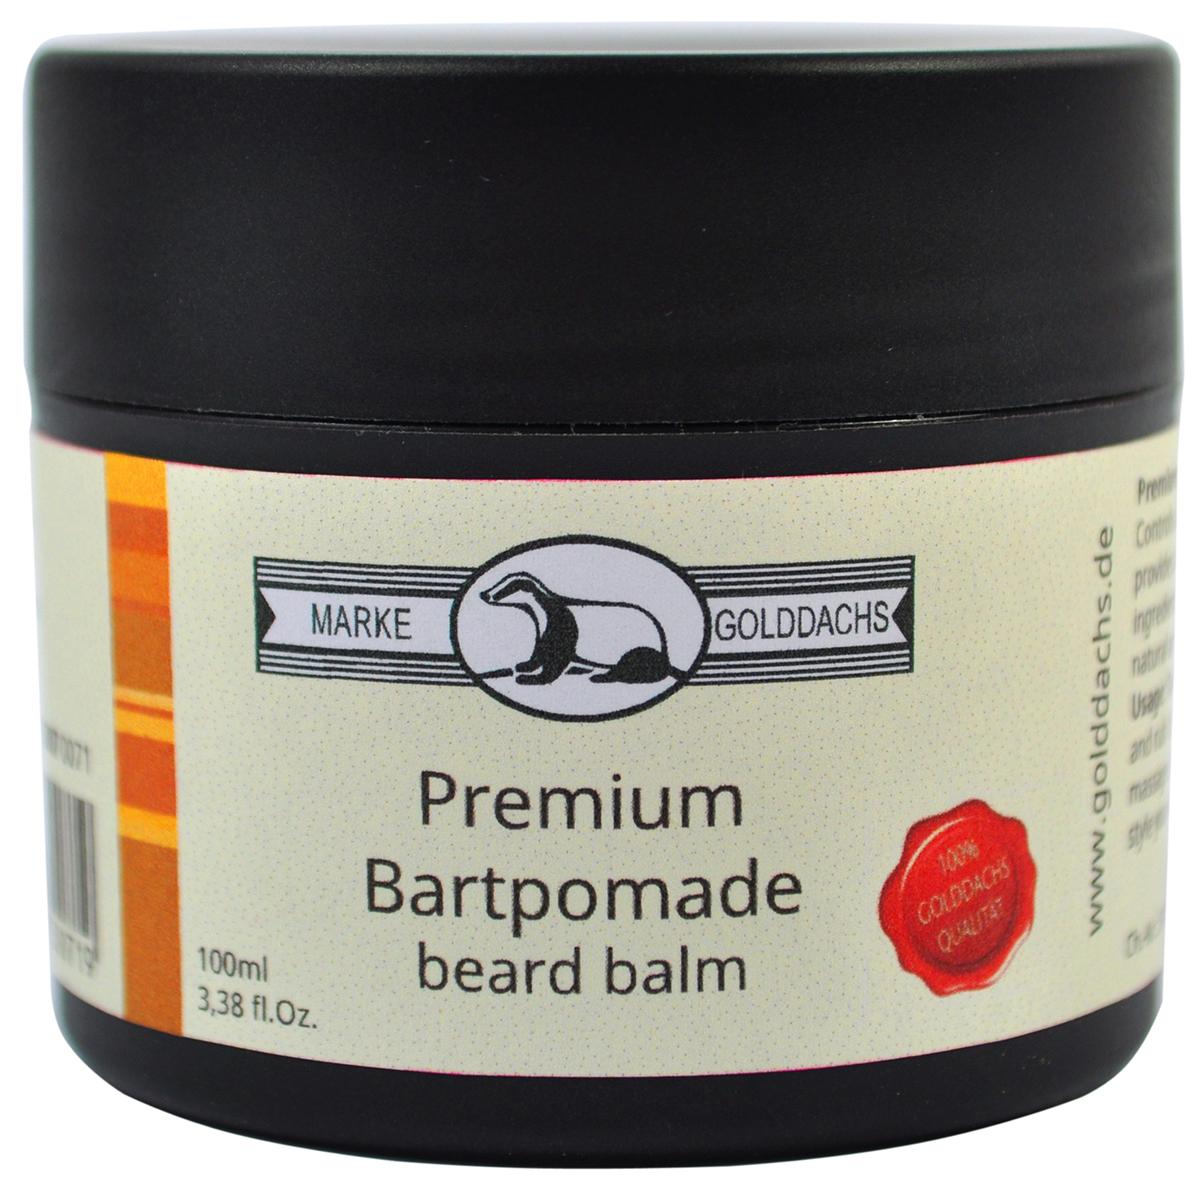 Golddachs Bartpomade